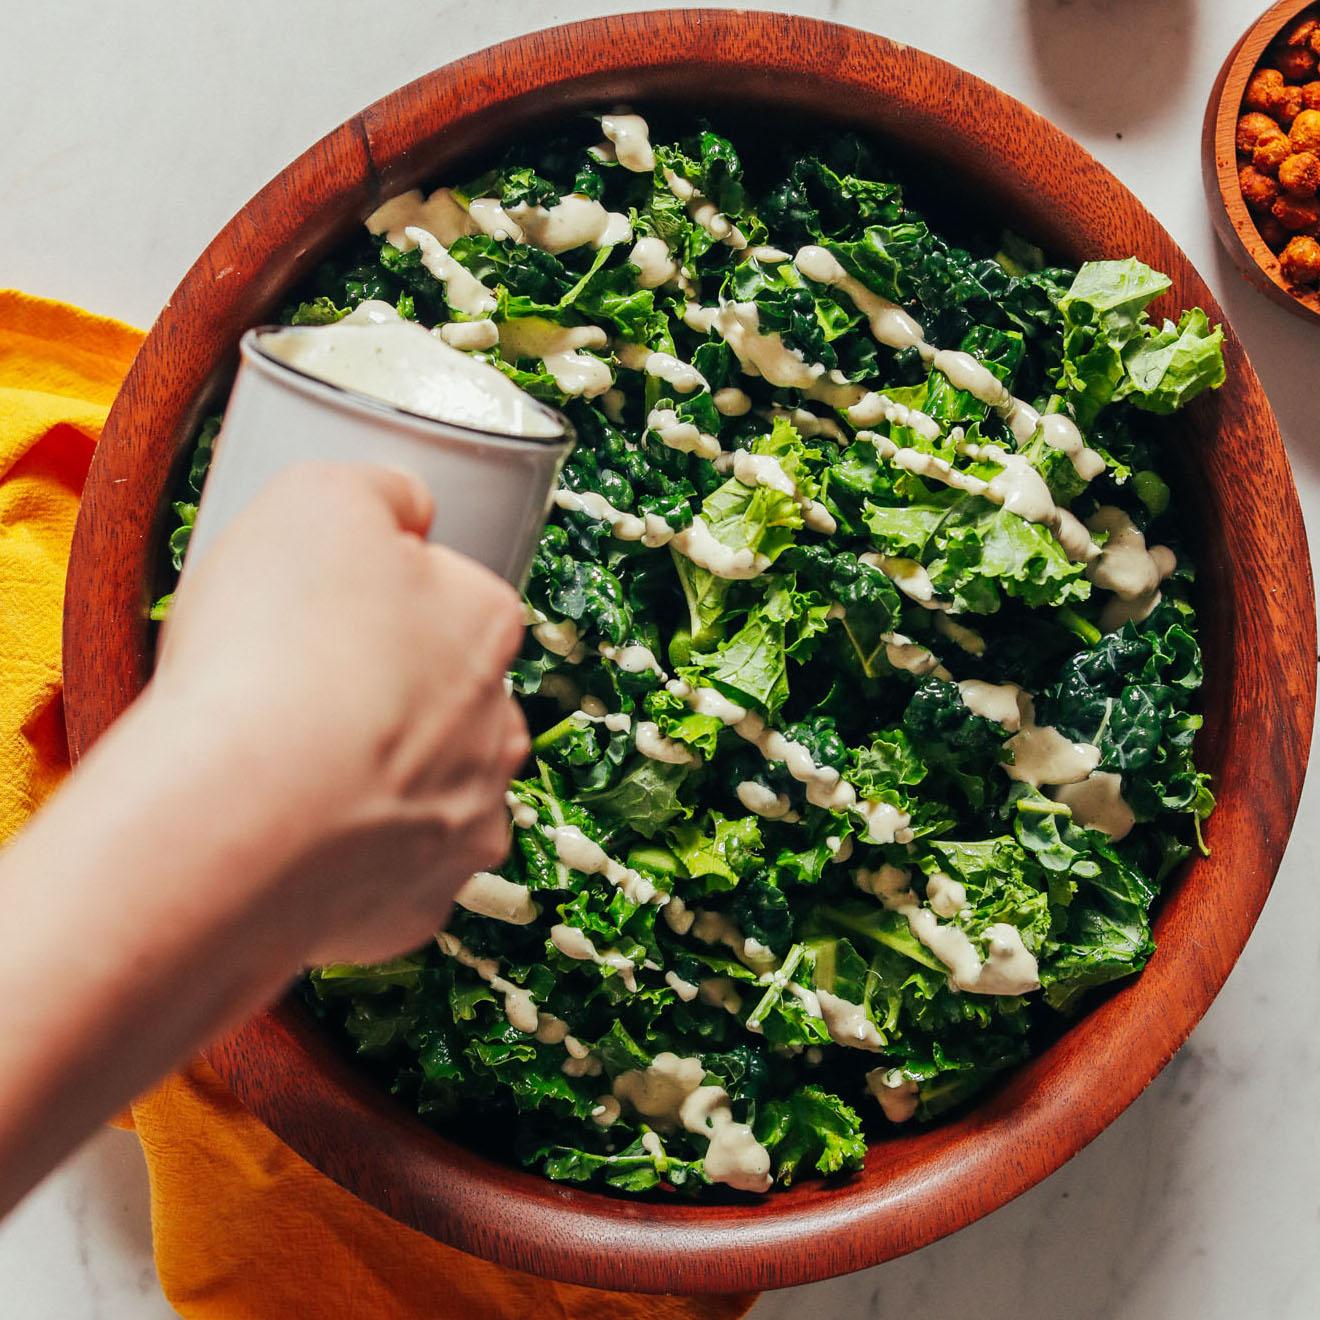 Drizzling vegan Caesar Dressing onto a kale salad